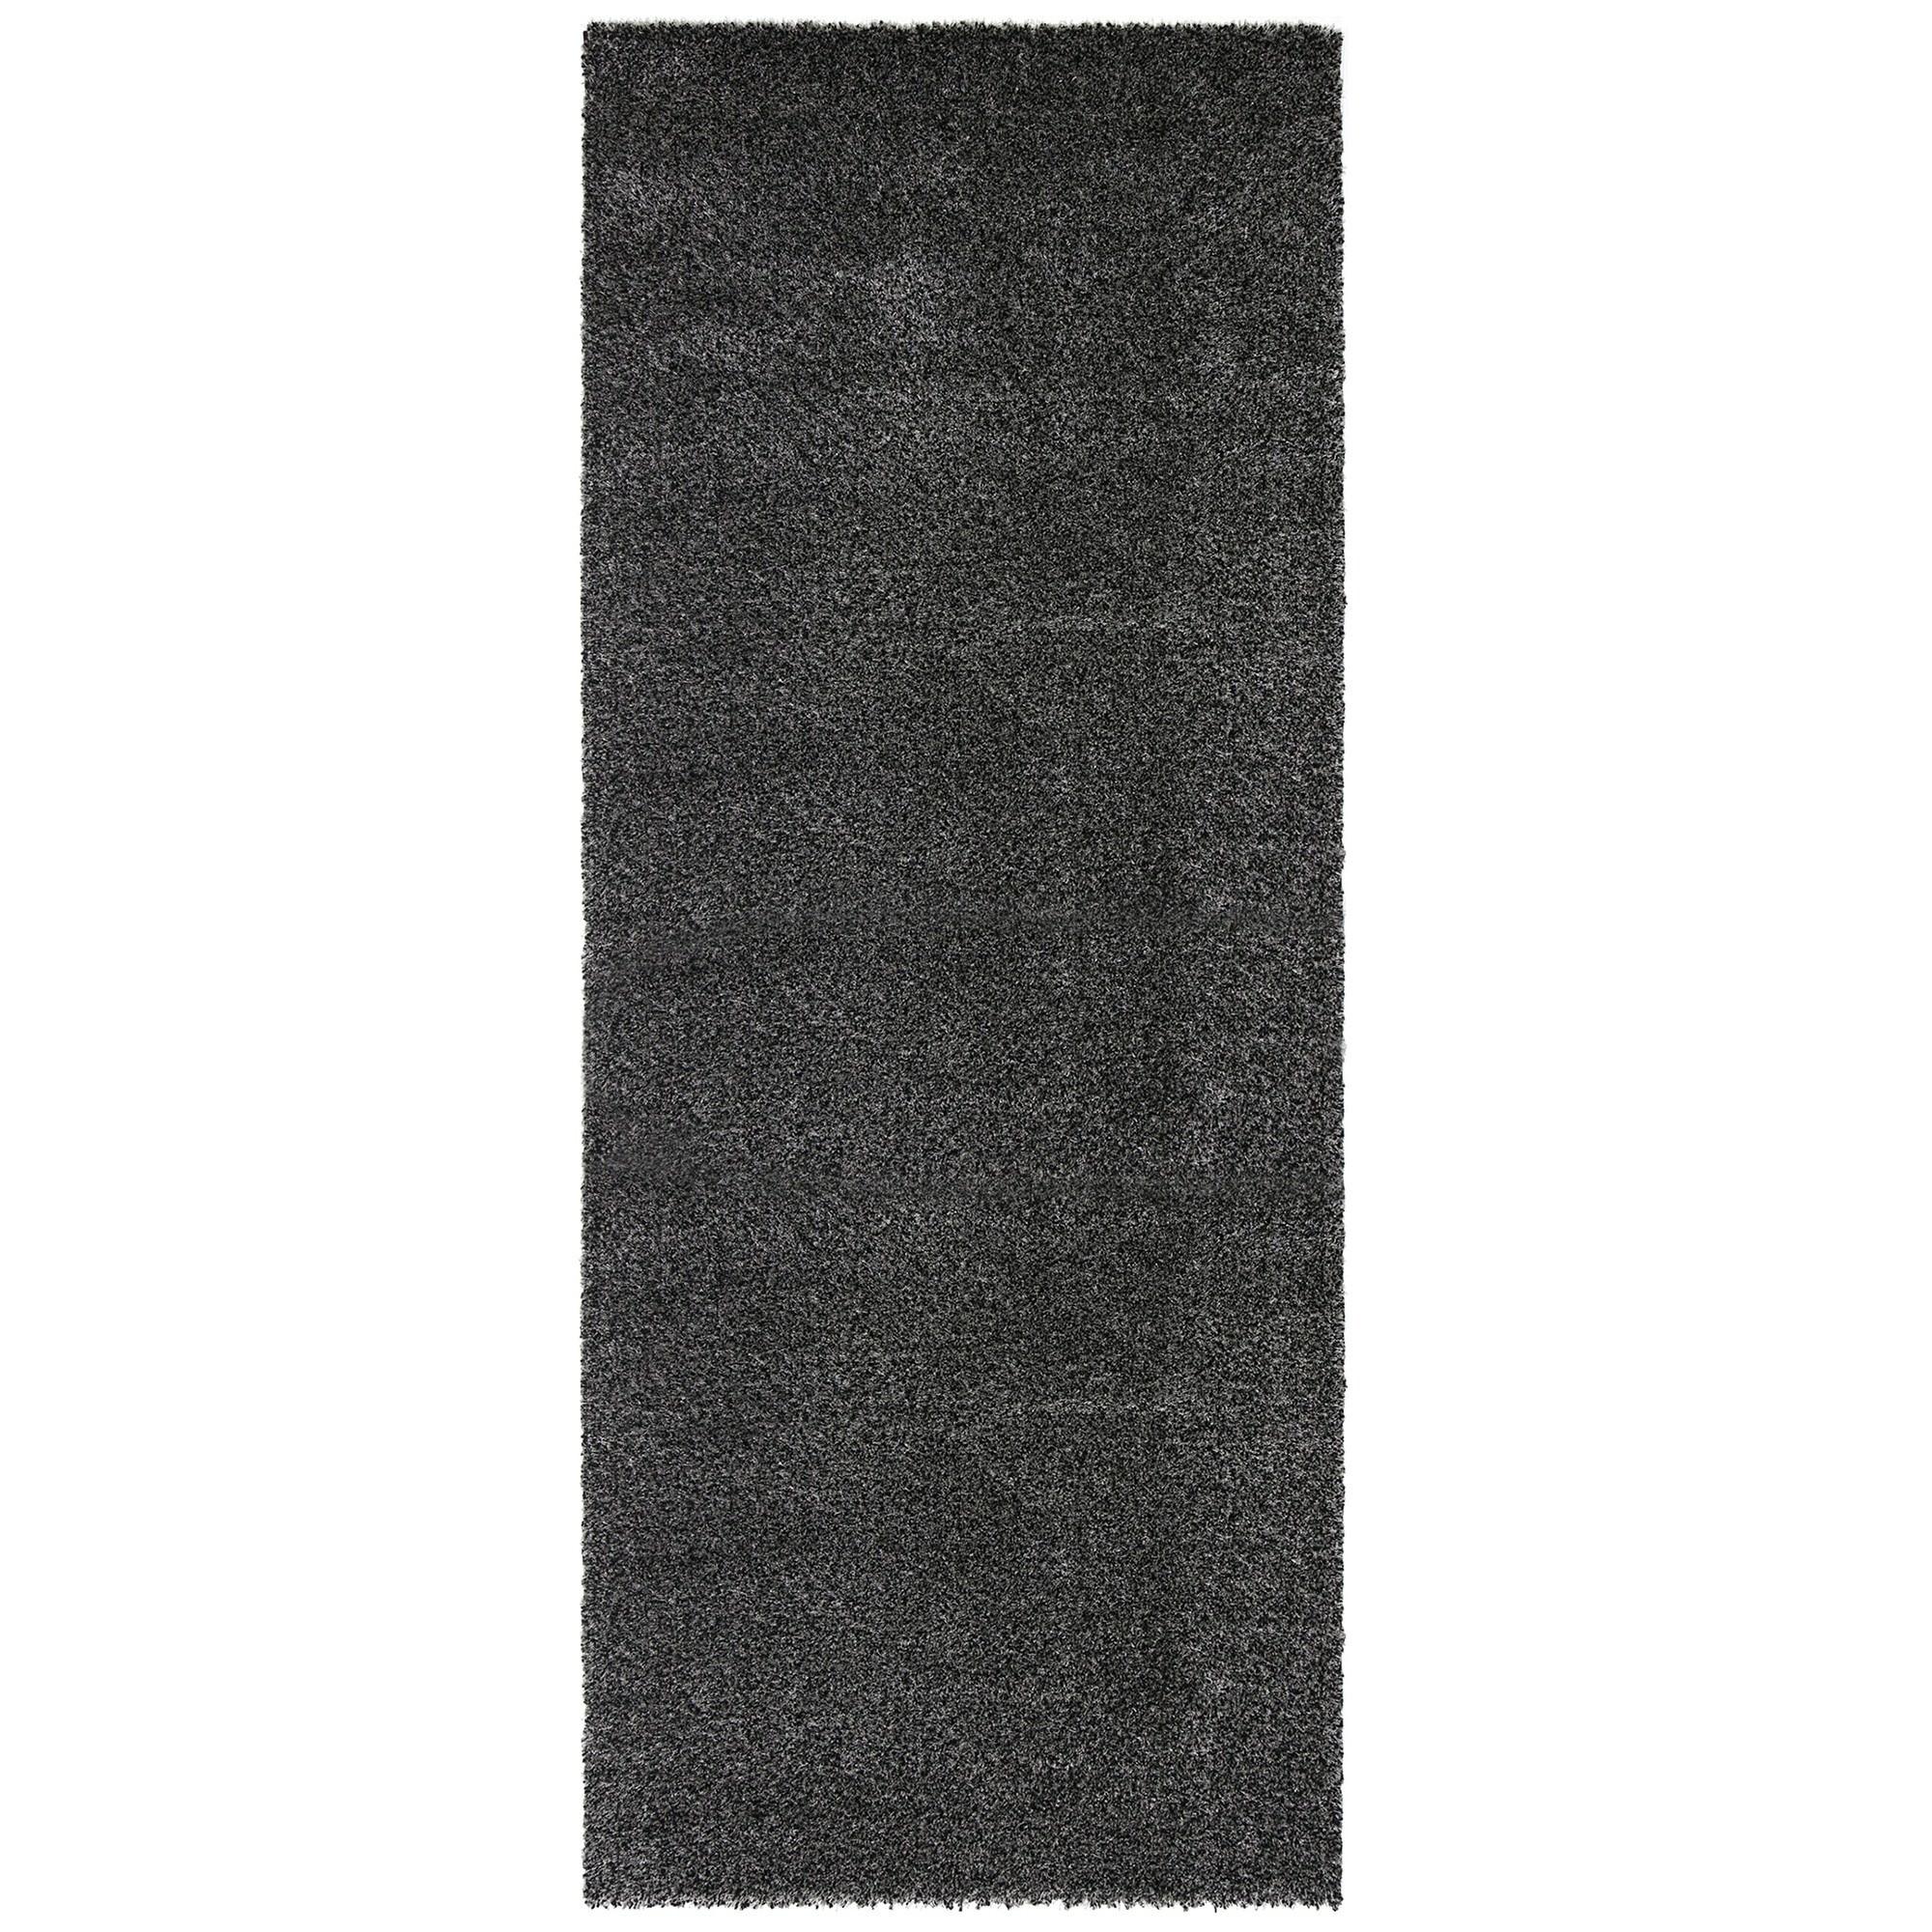 Siesta Plain Shaggy Runner Rug, 80x200cm, Charcoal